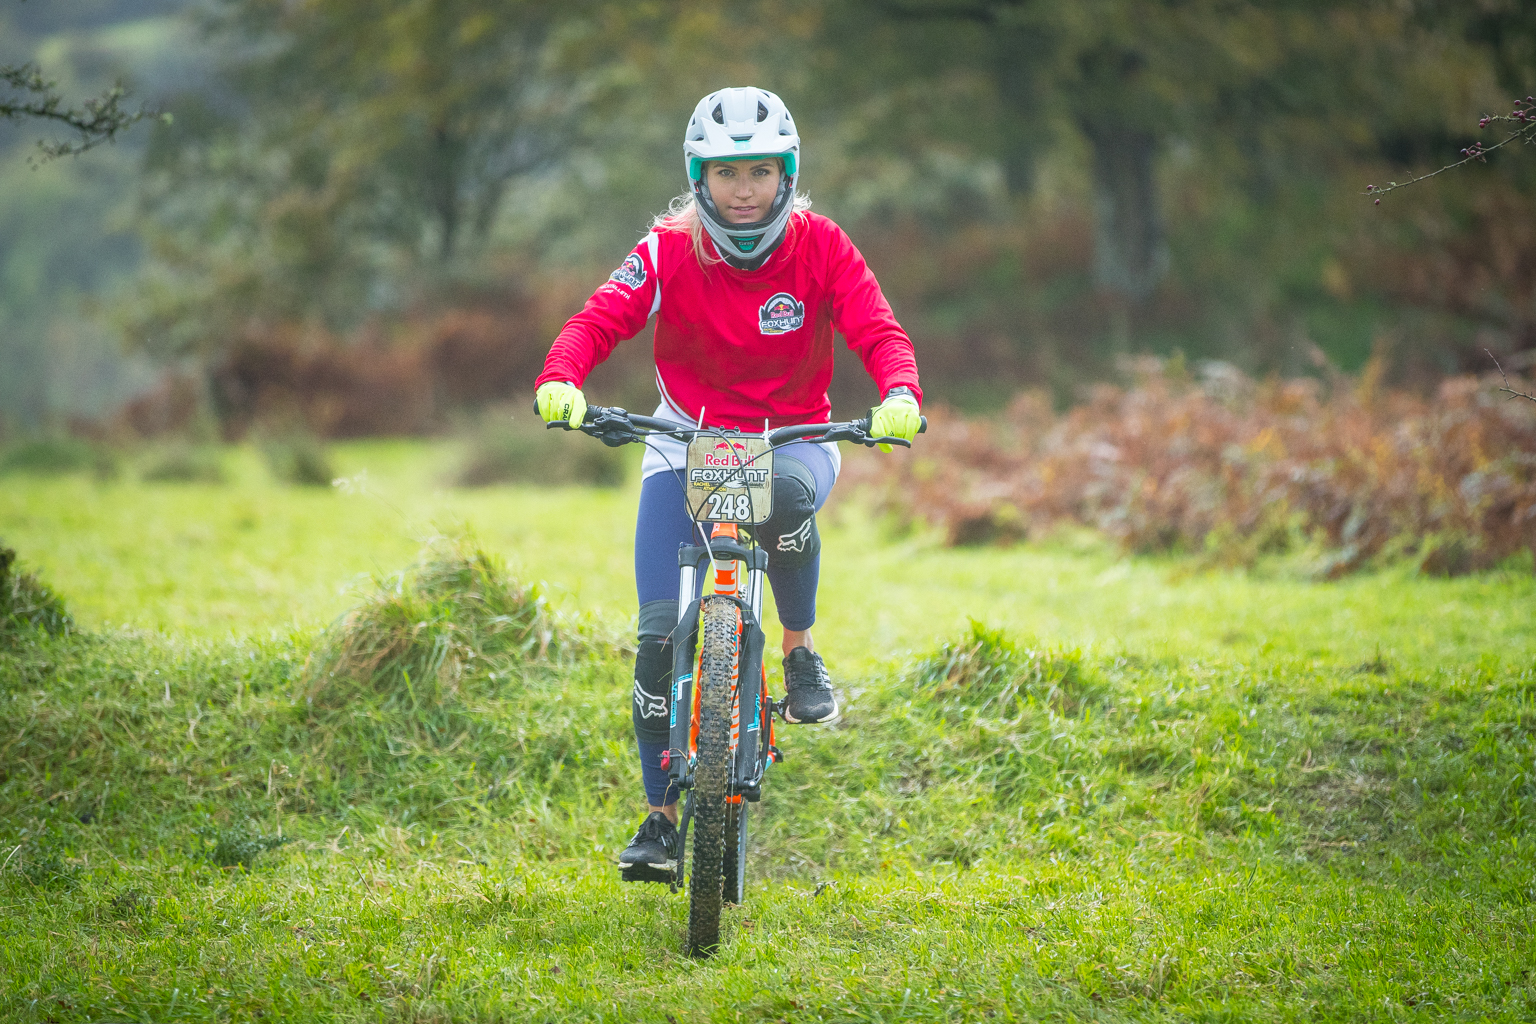 Faya - Fitness On Toast - Wales EE 4G Balloon Signal Bike Rural Apple Watch Adventure Cyclicing Downhill Mountain Bike Biking Workout Event-20